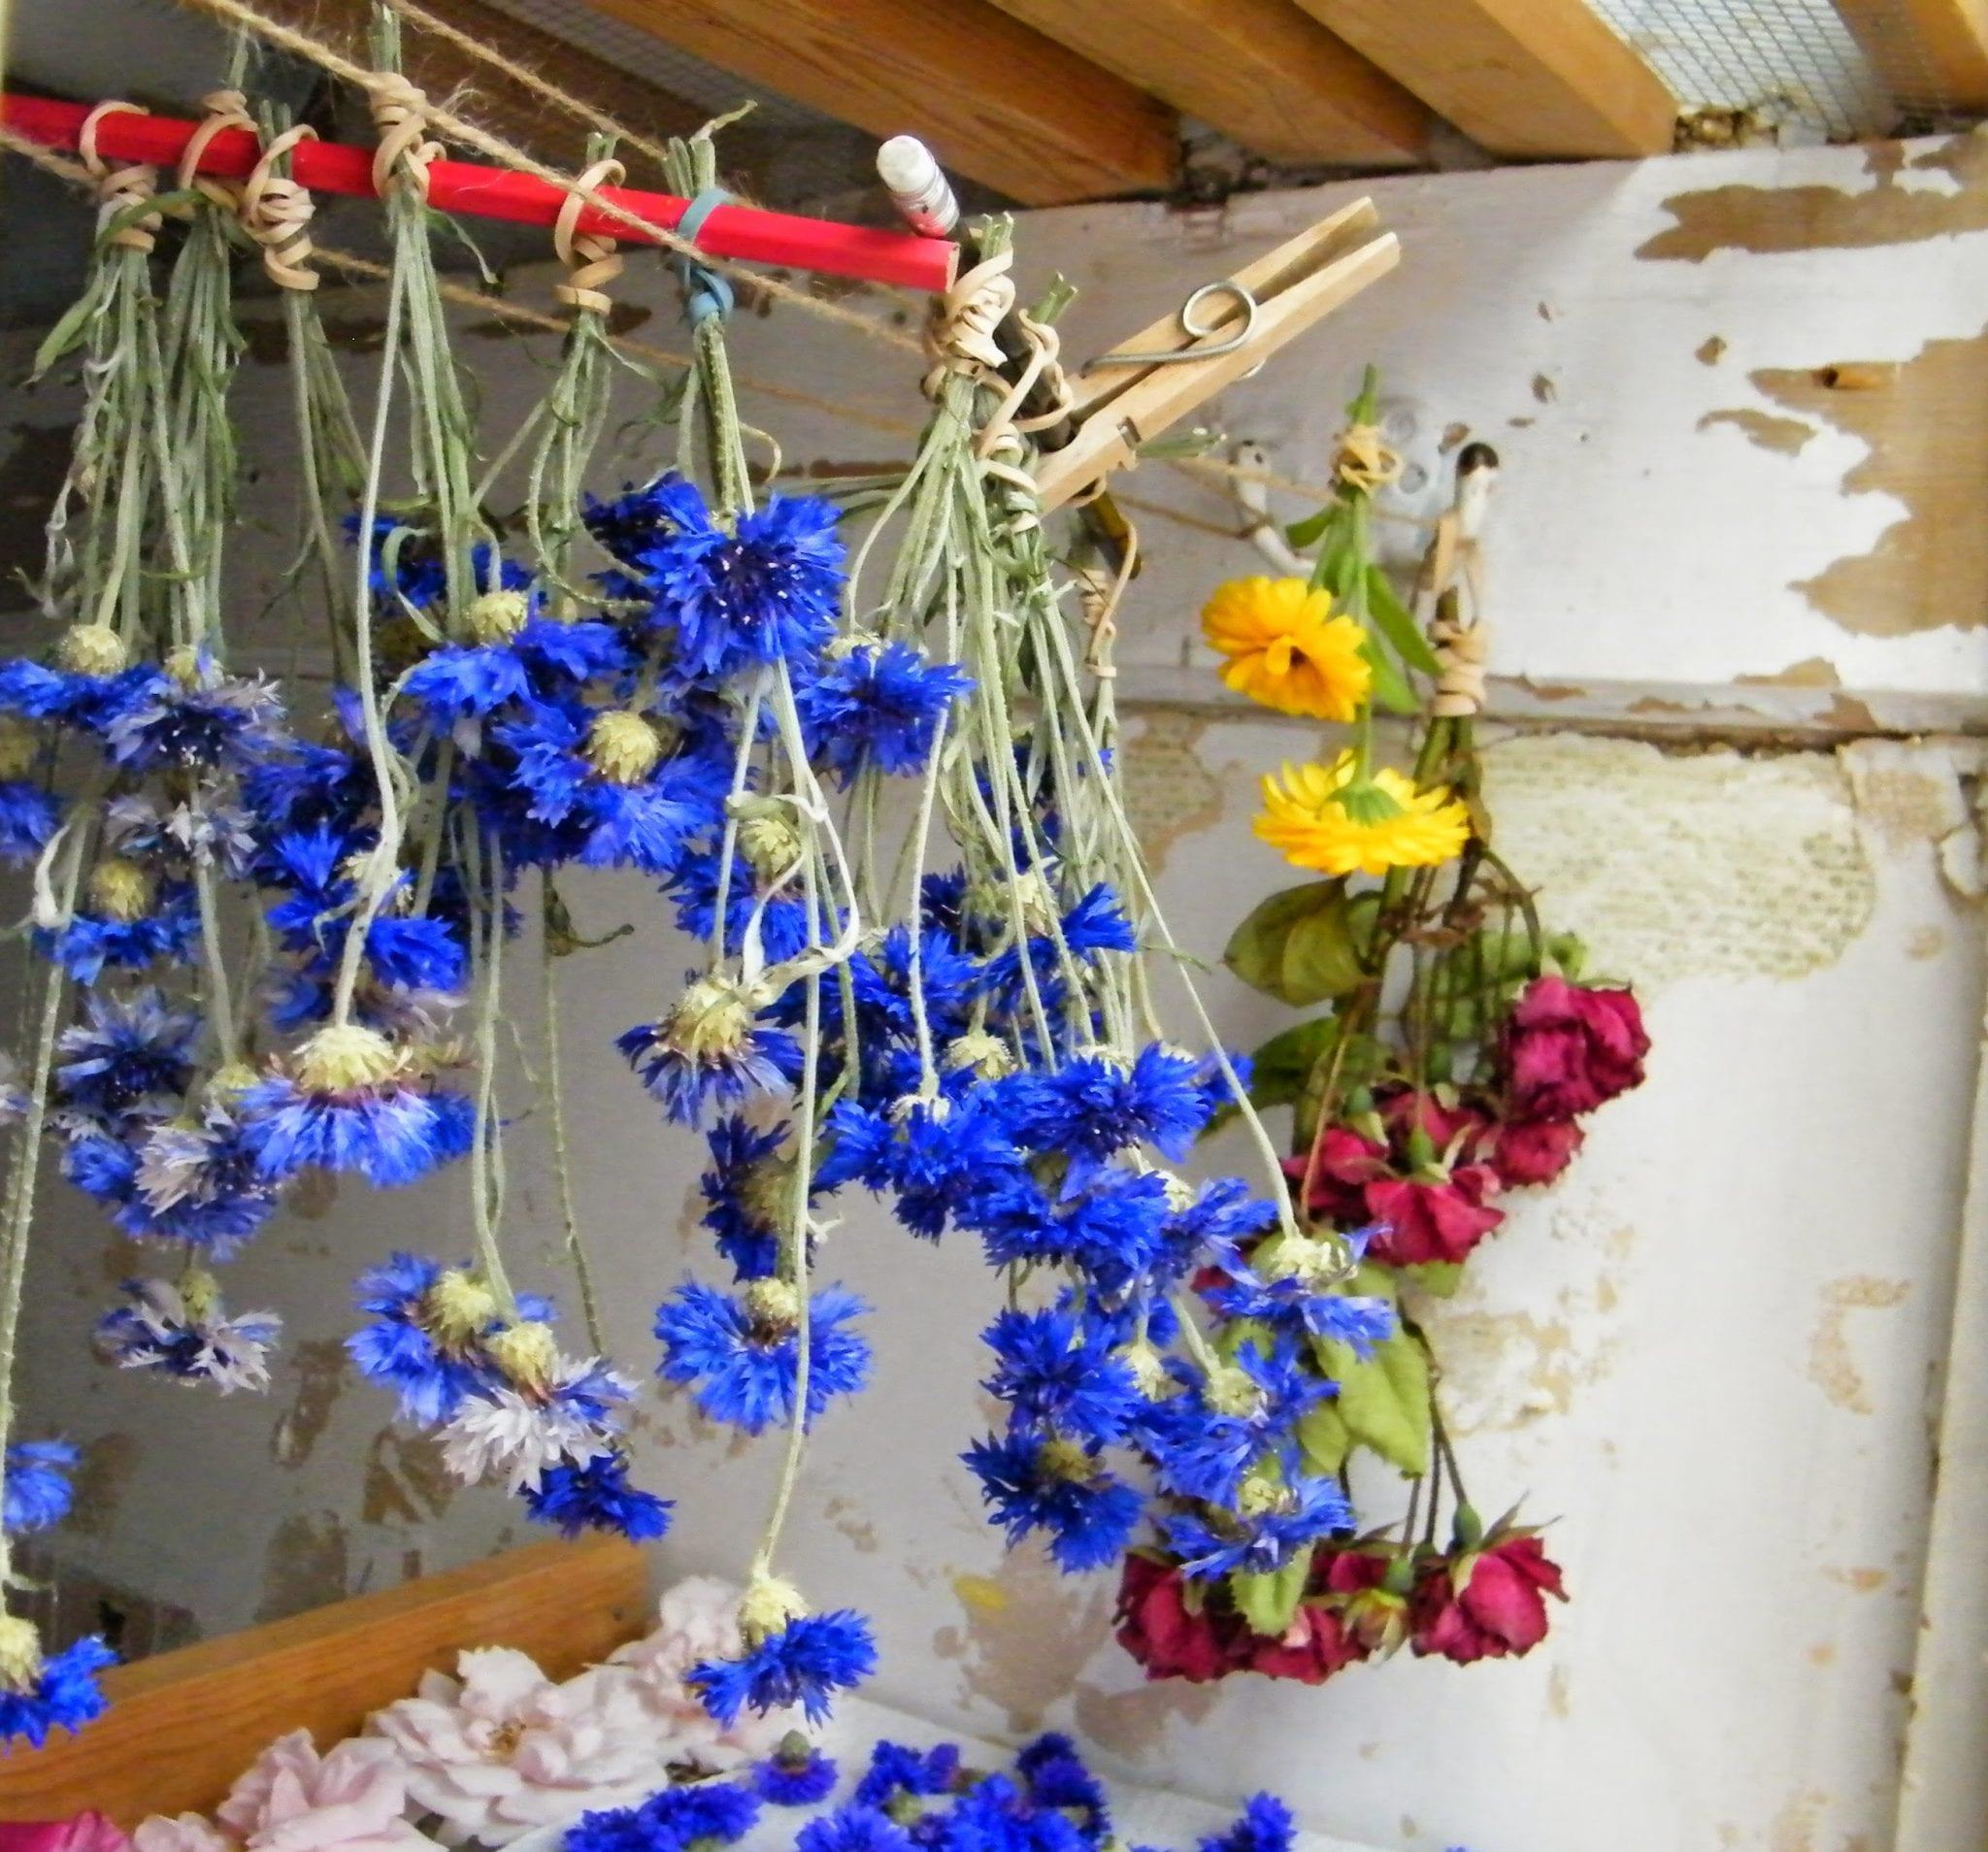 drying flowers in airing cupboard